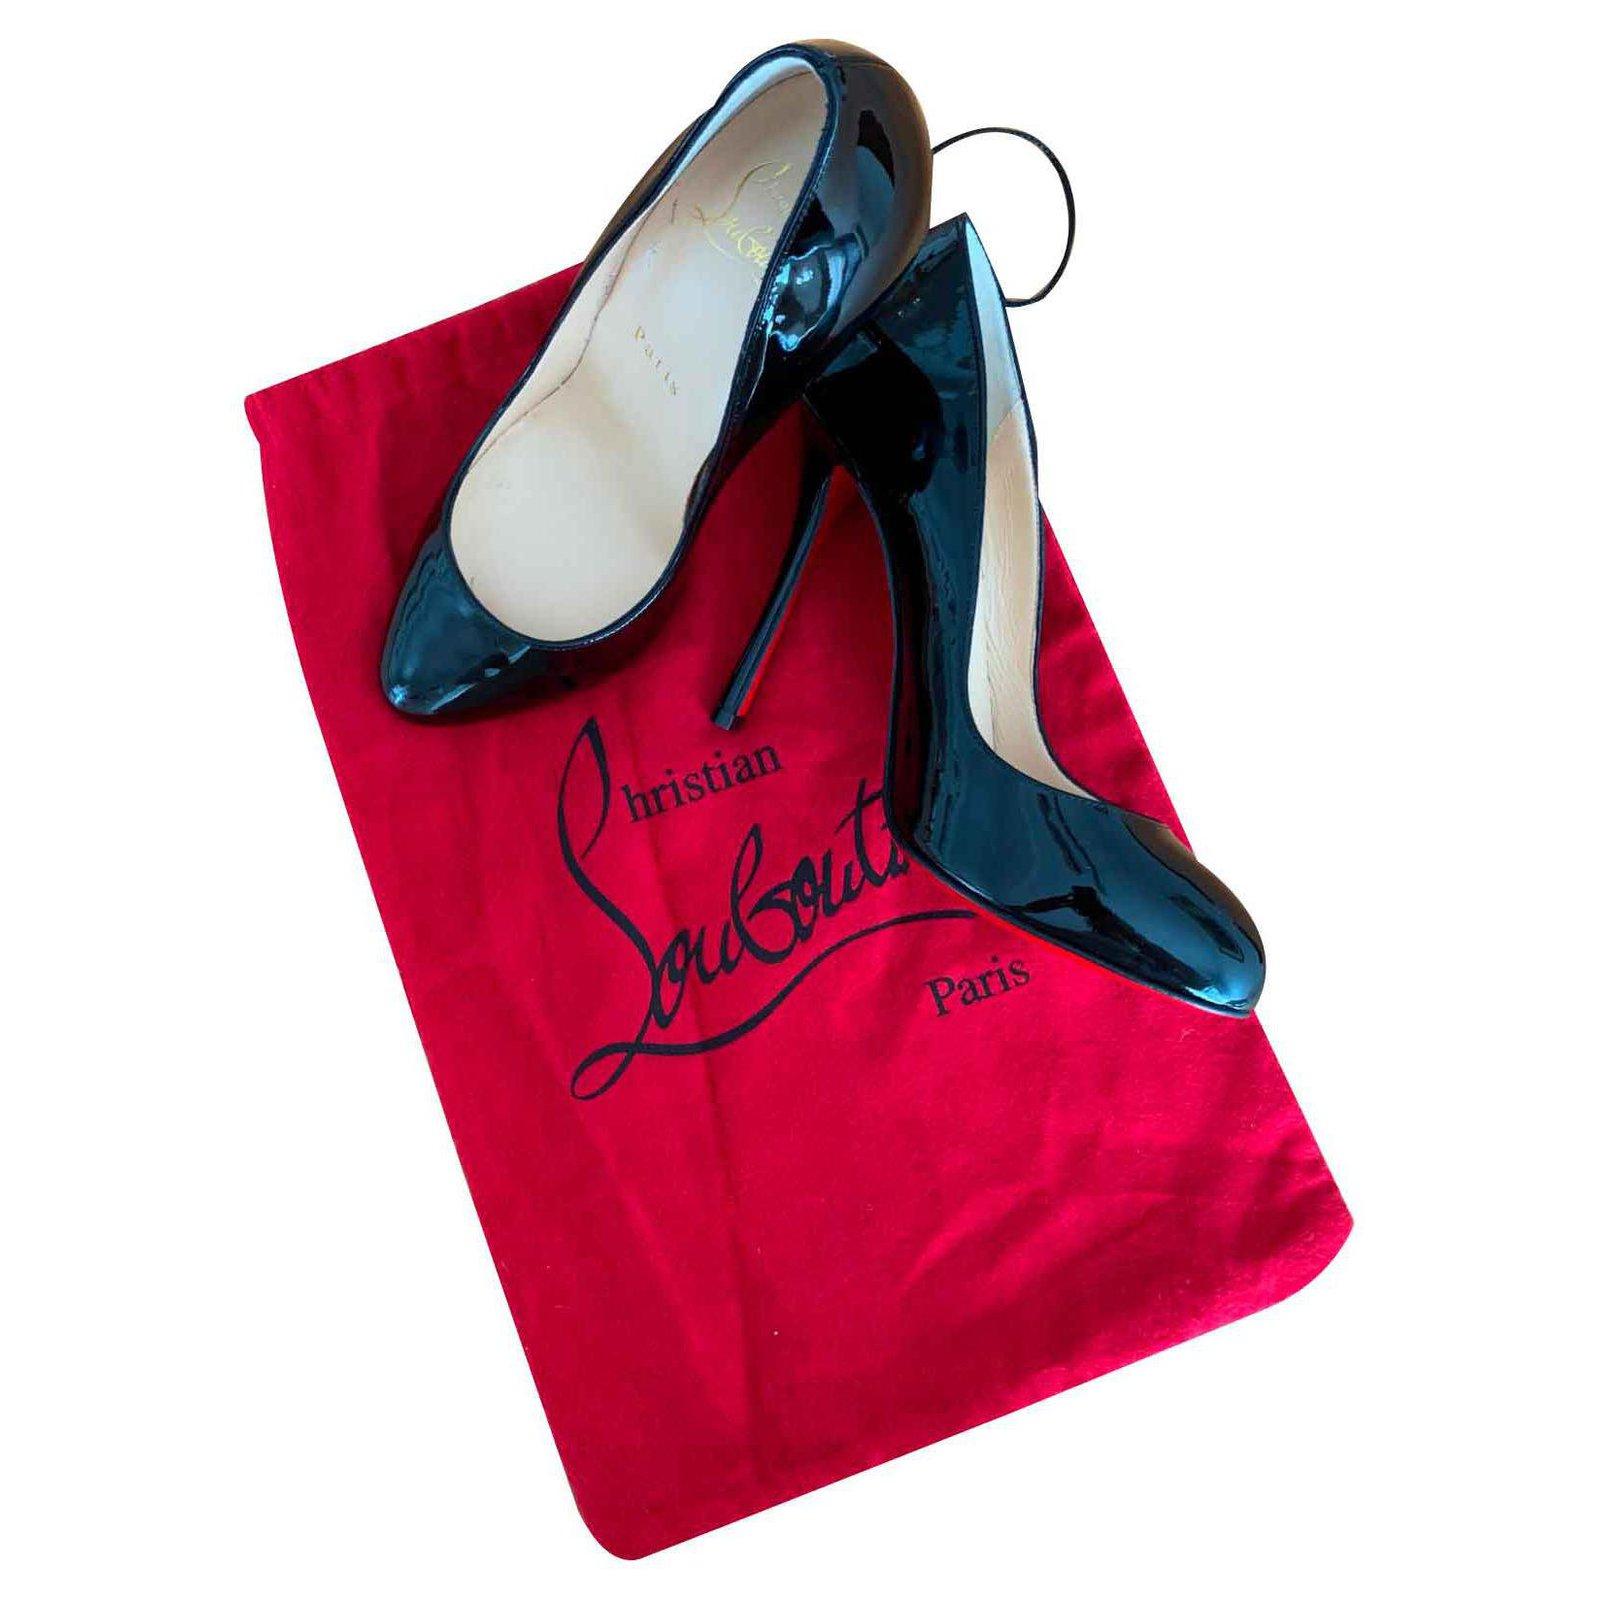 Christian Louboutin Fifi leather heels